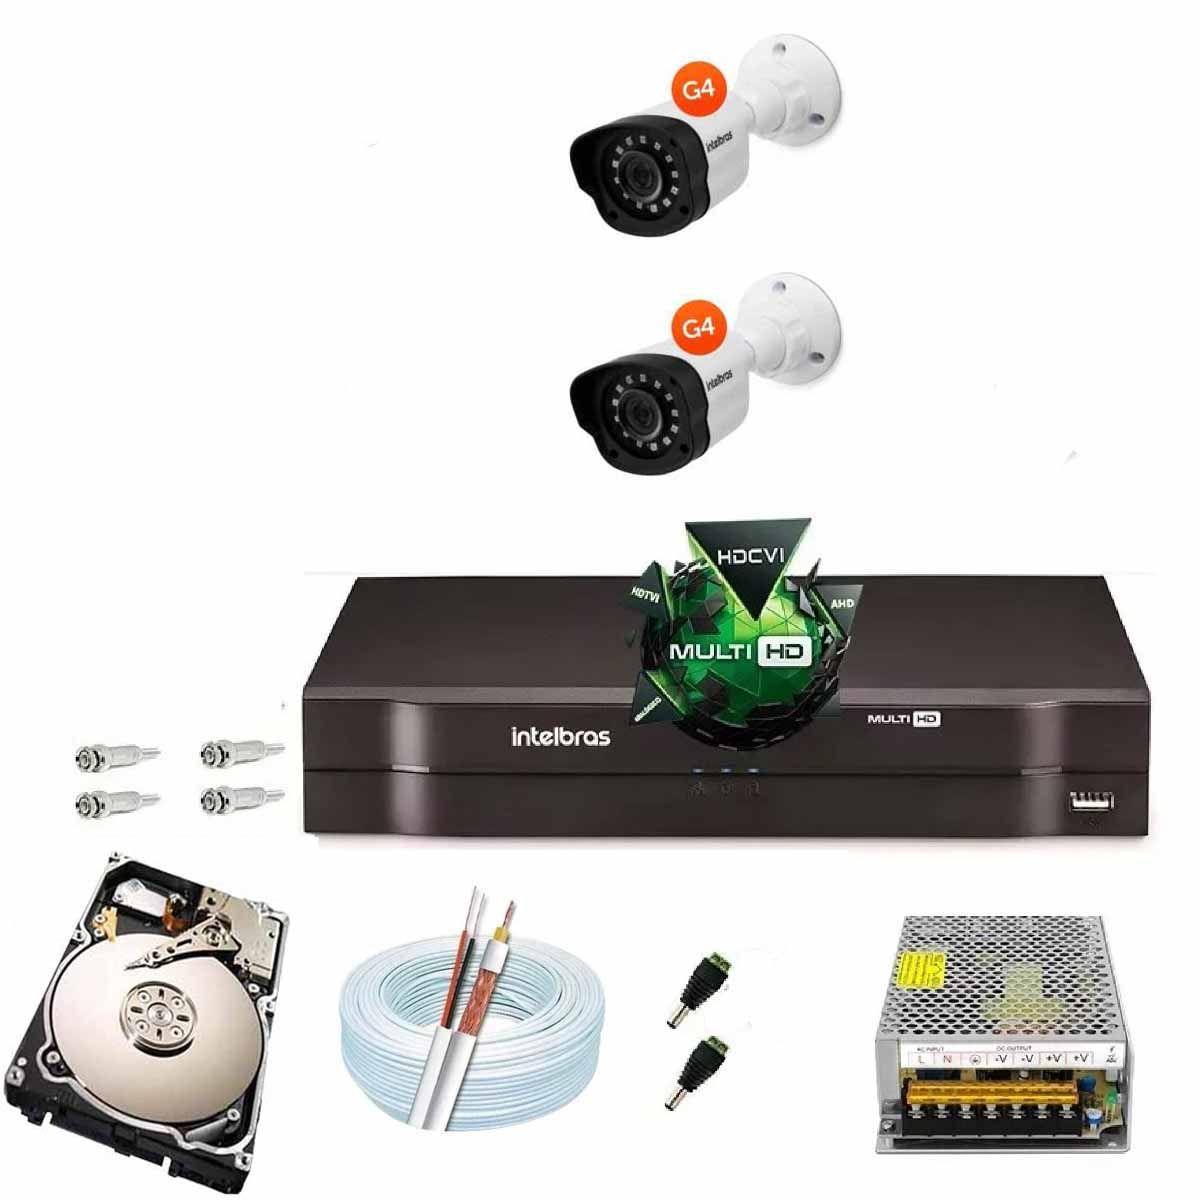 Kit Cftv 2 Câmeras VM 1120B Bullet G4 720p Dvr 4 Canais Intelbras MHDX + HD 250GB